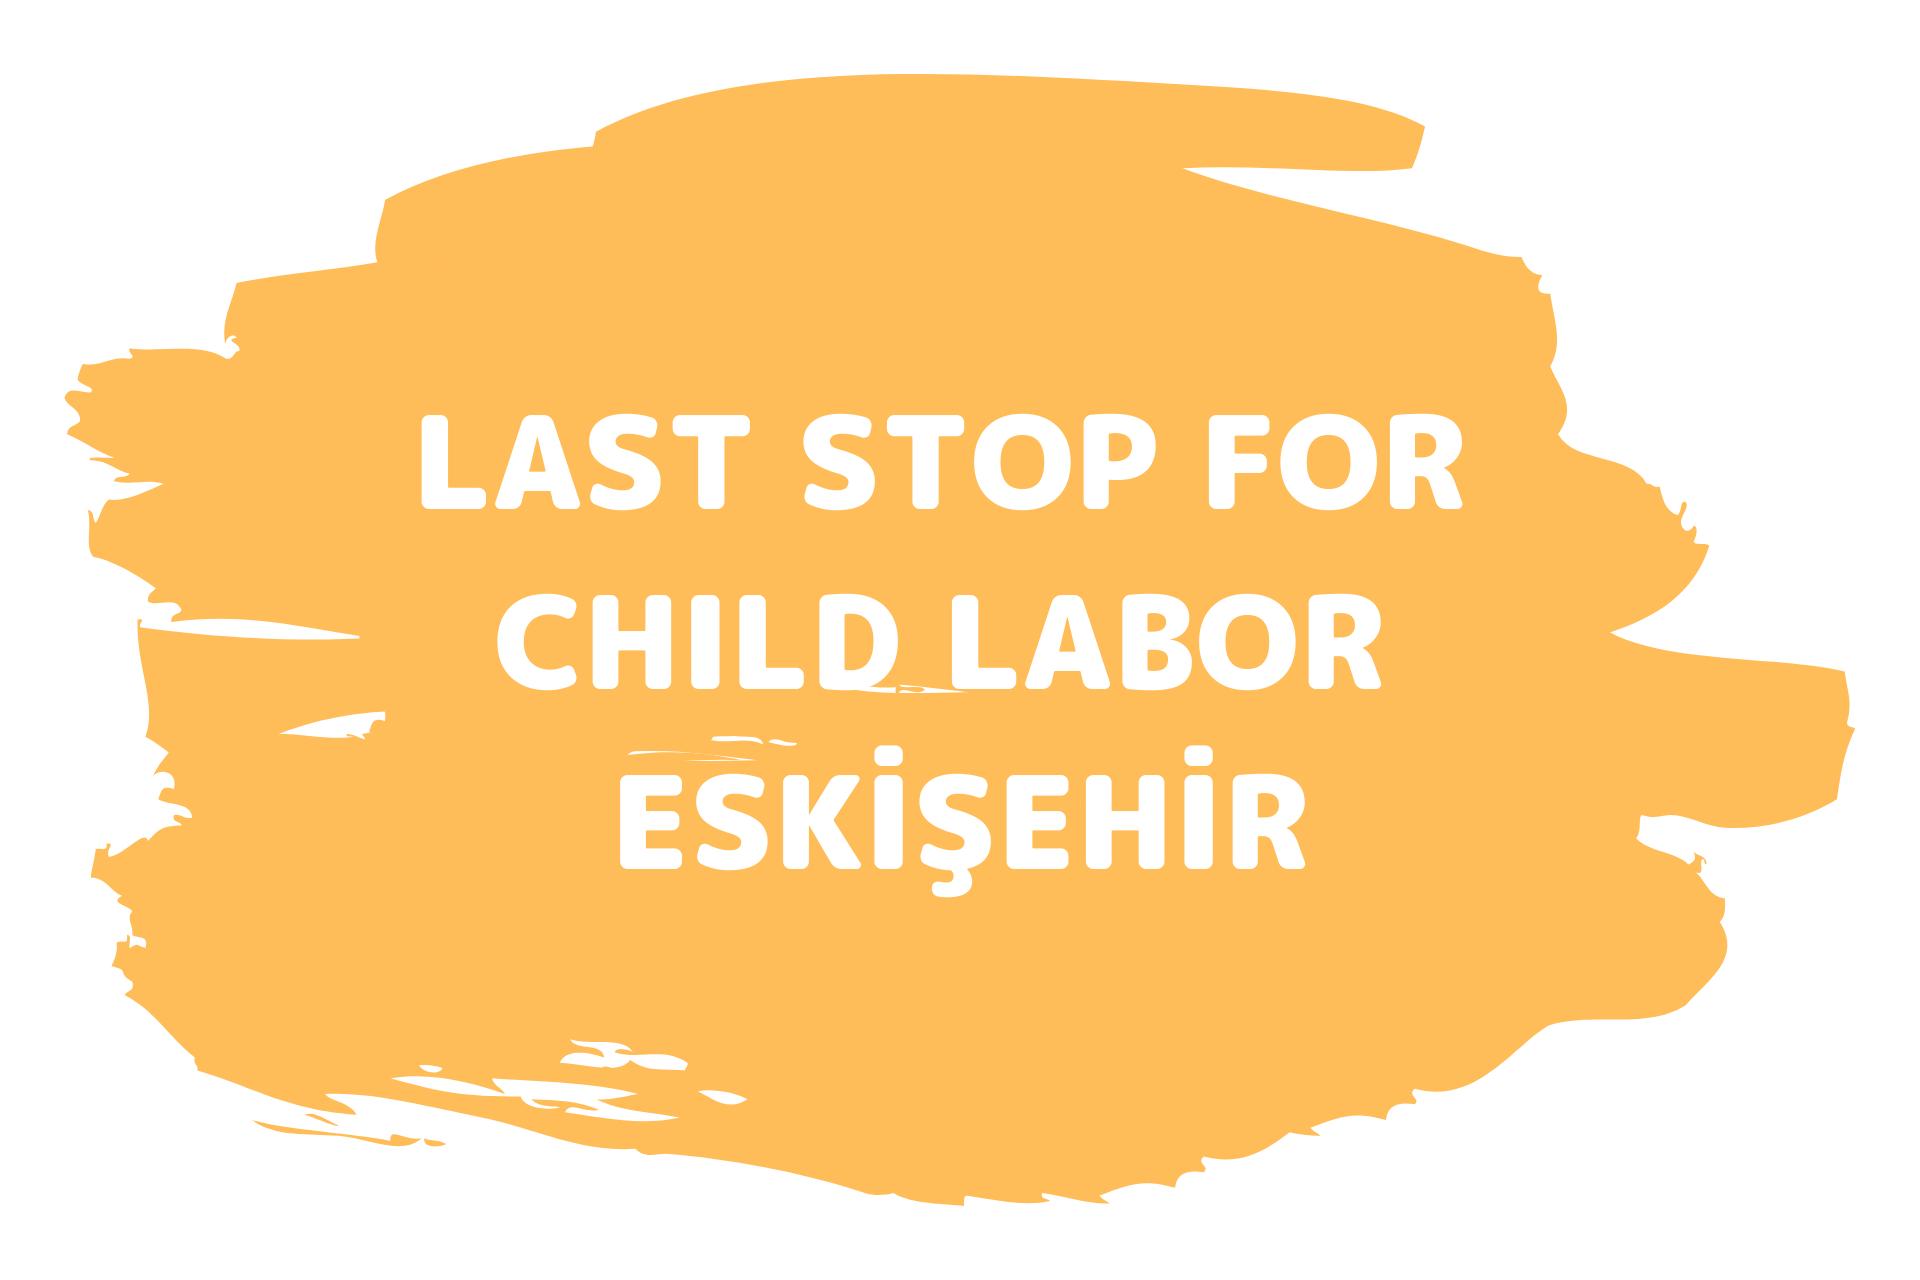 last-stop-for-child-labor-eskisehir